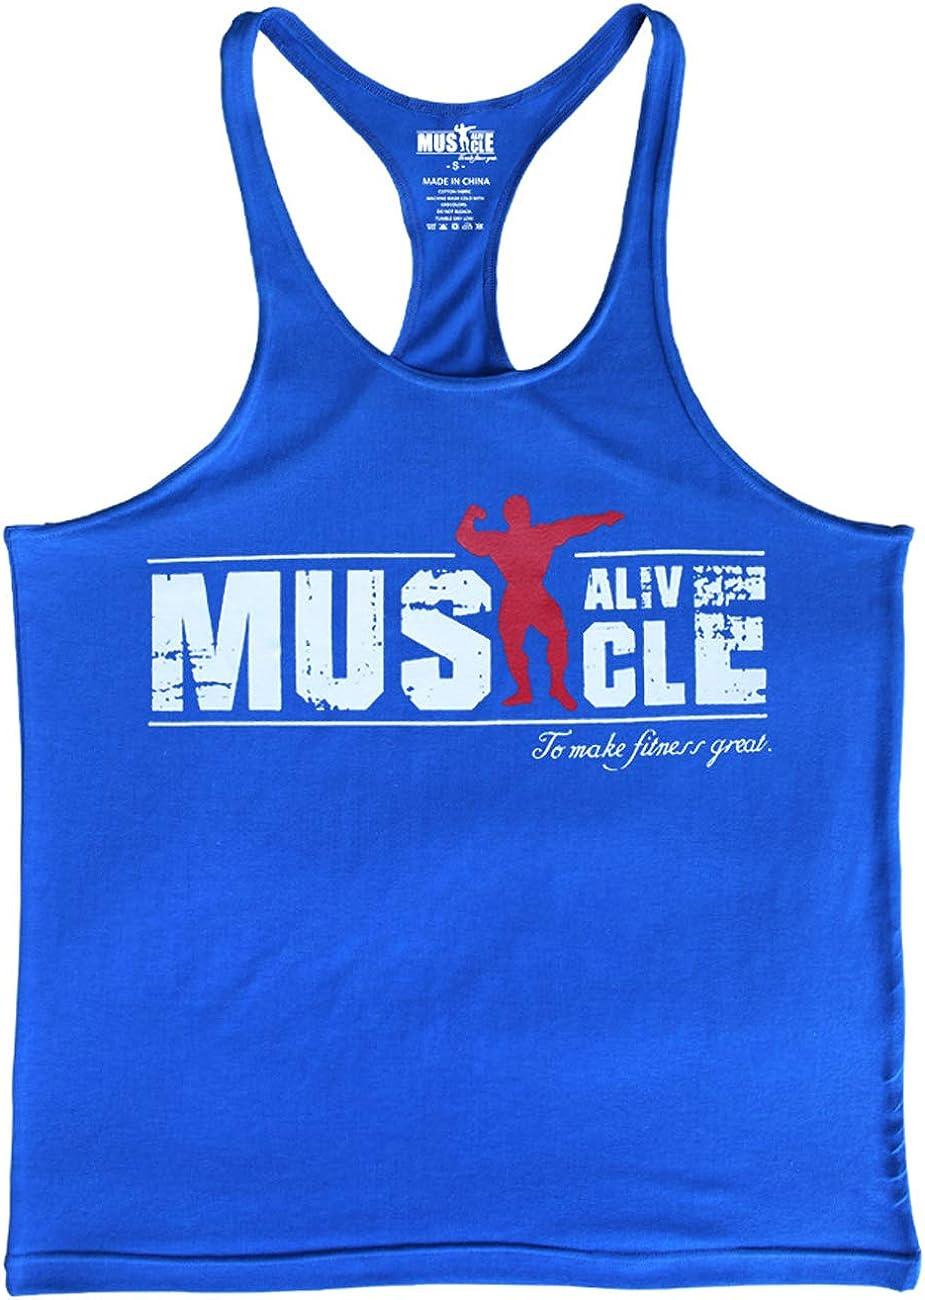 Muscle Alive Mens Bodybuilding Stringer Tank Tops Cotton Racerback